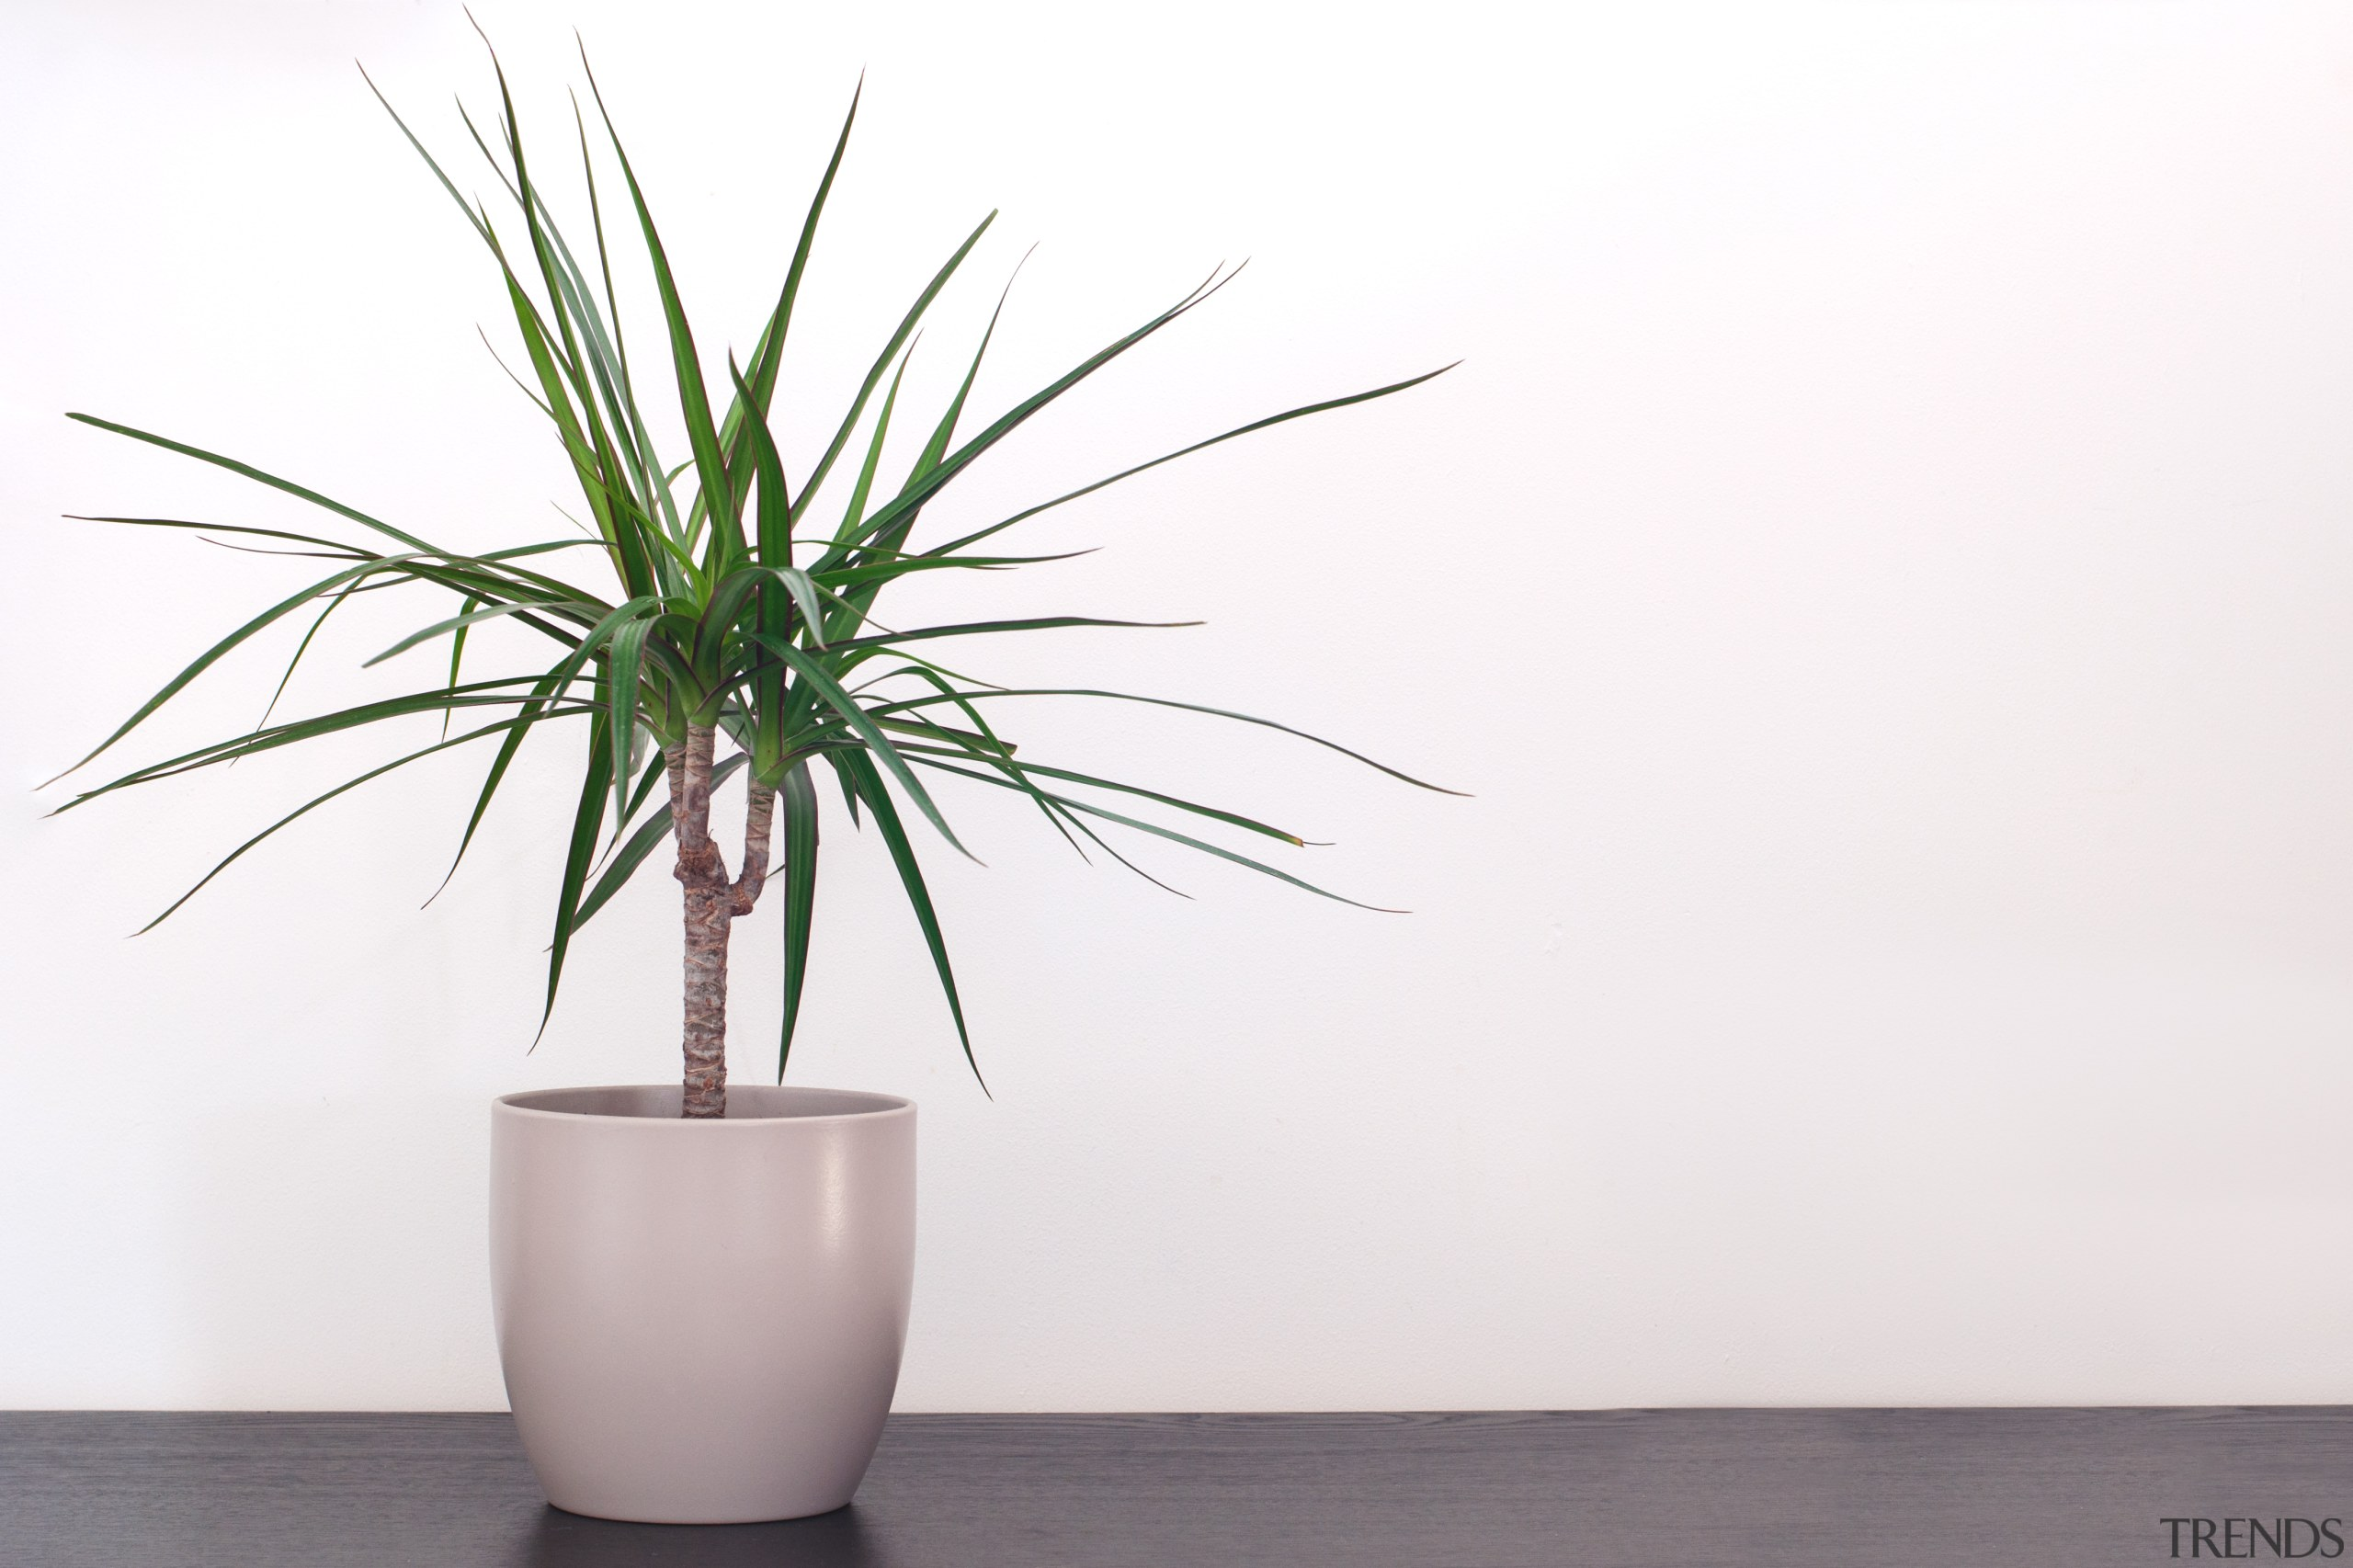 Dracaena fragrans corn plant - Instagram's most popular